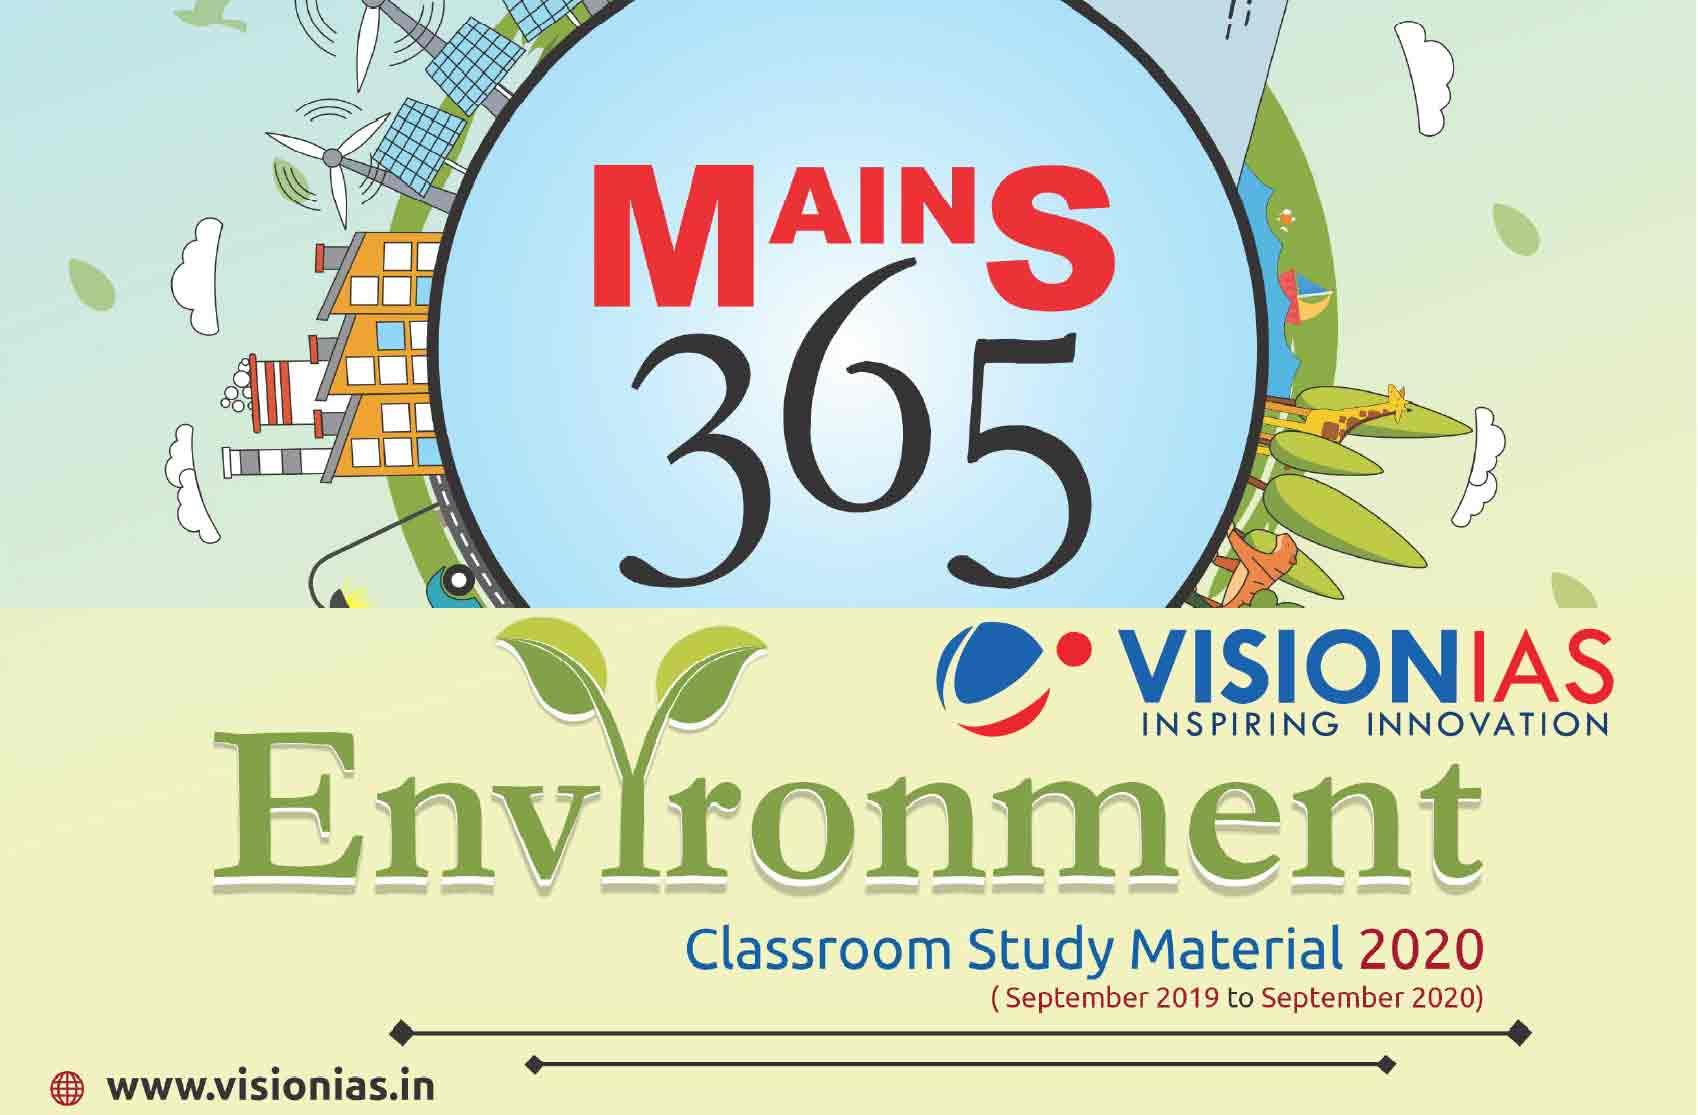 Vision IAS Mains 365 Environment 2020